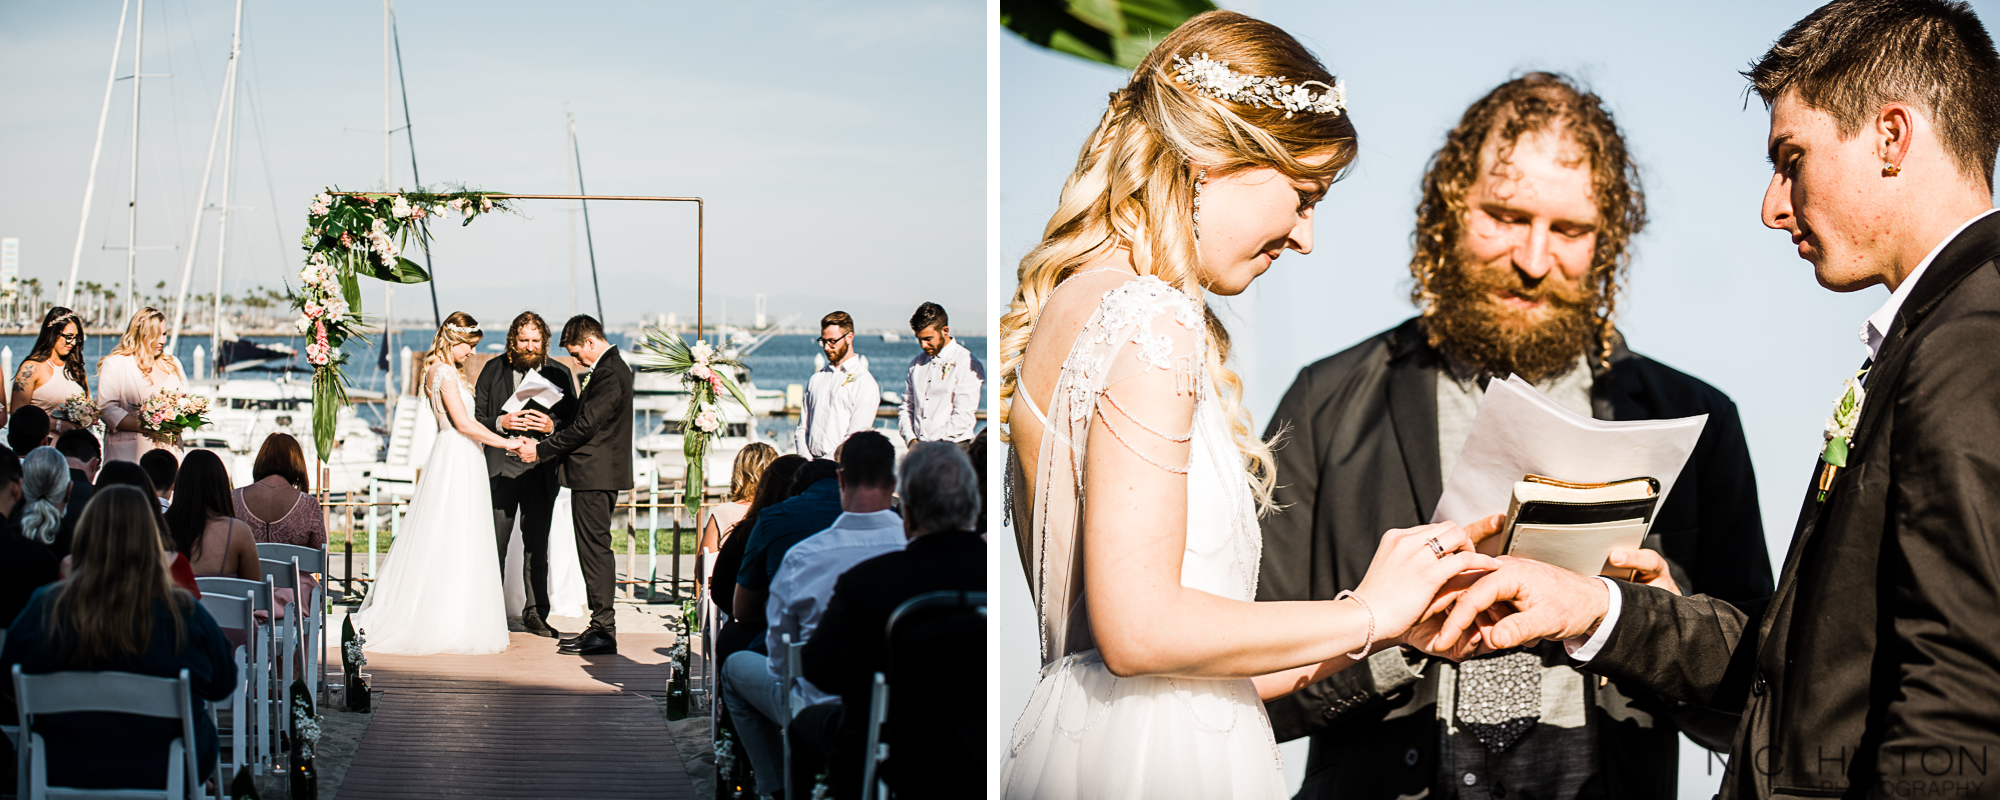 Hotel-Maya-Long-Beach-Wedding-Ceremony.jpg